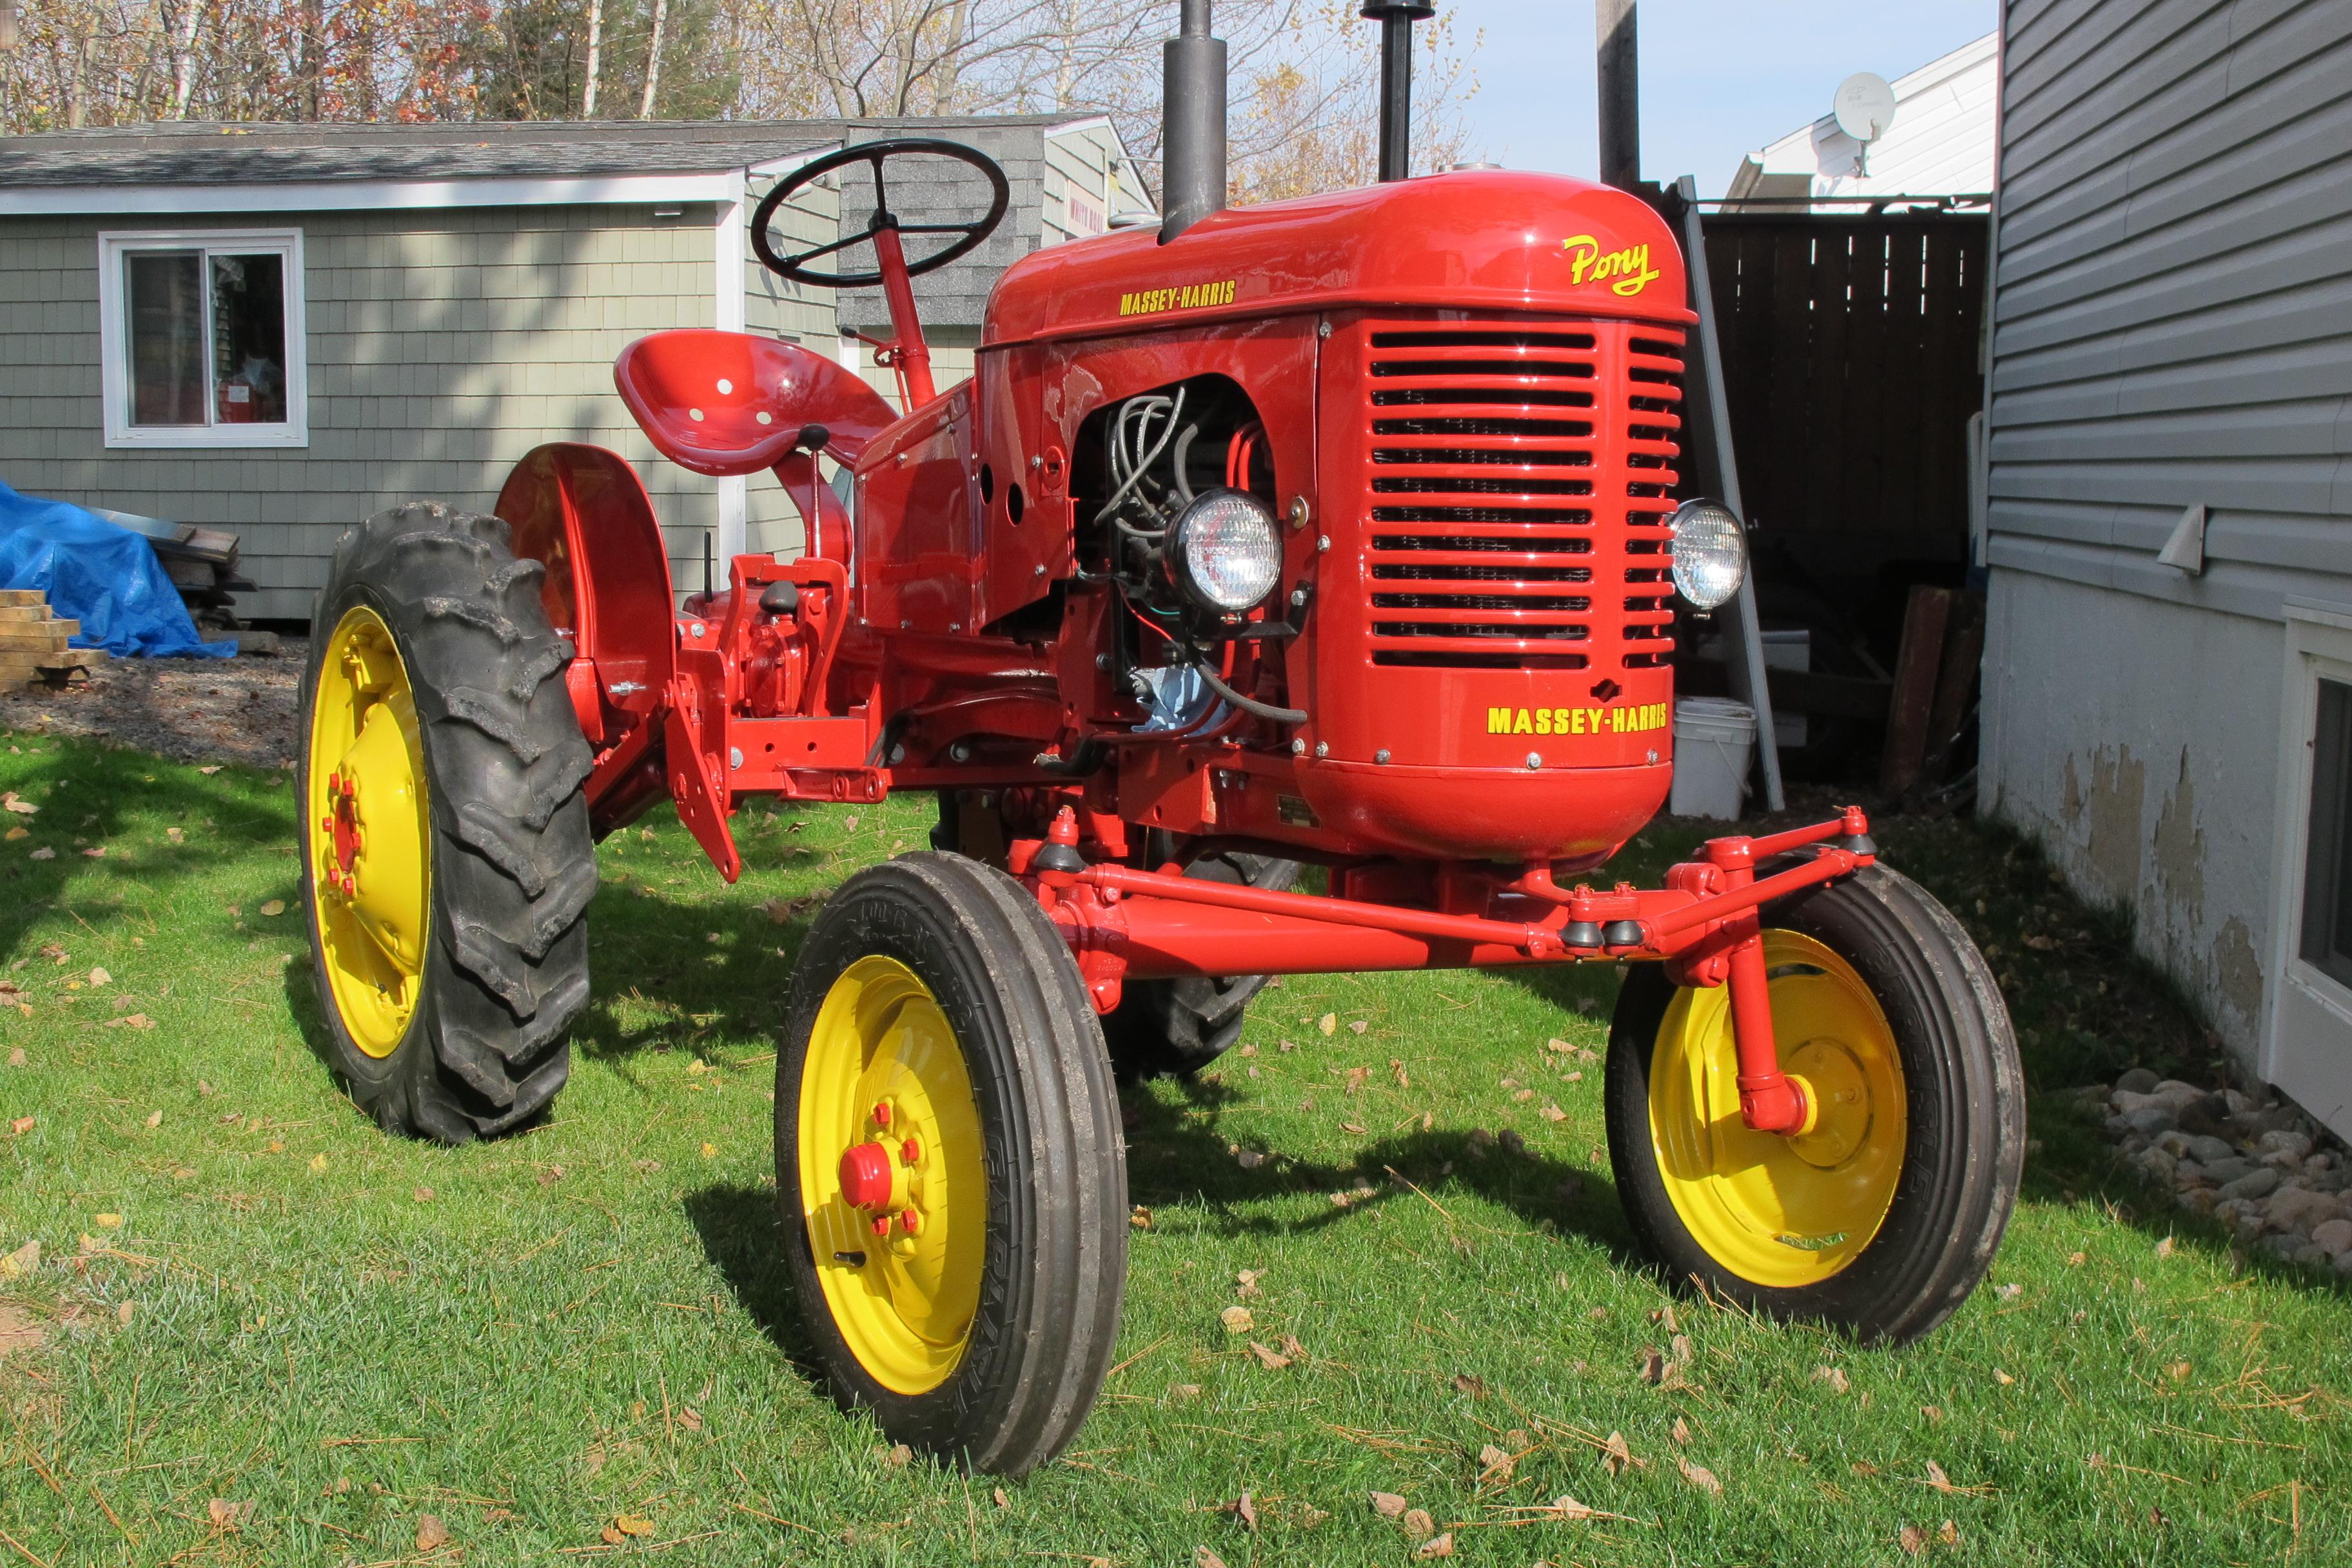 1952 Massey Harris Pony Tractor : Massey harris pony tractor this